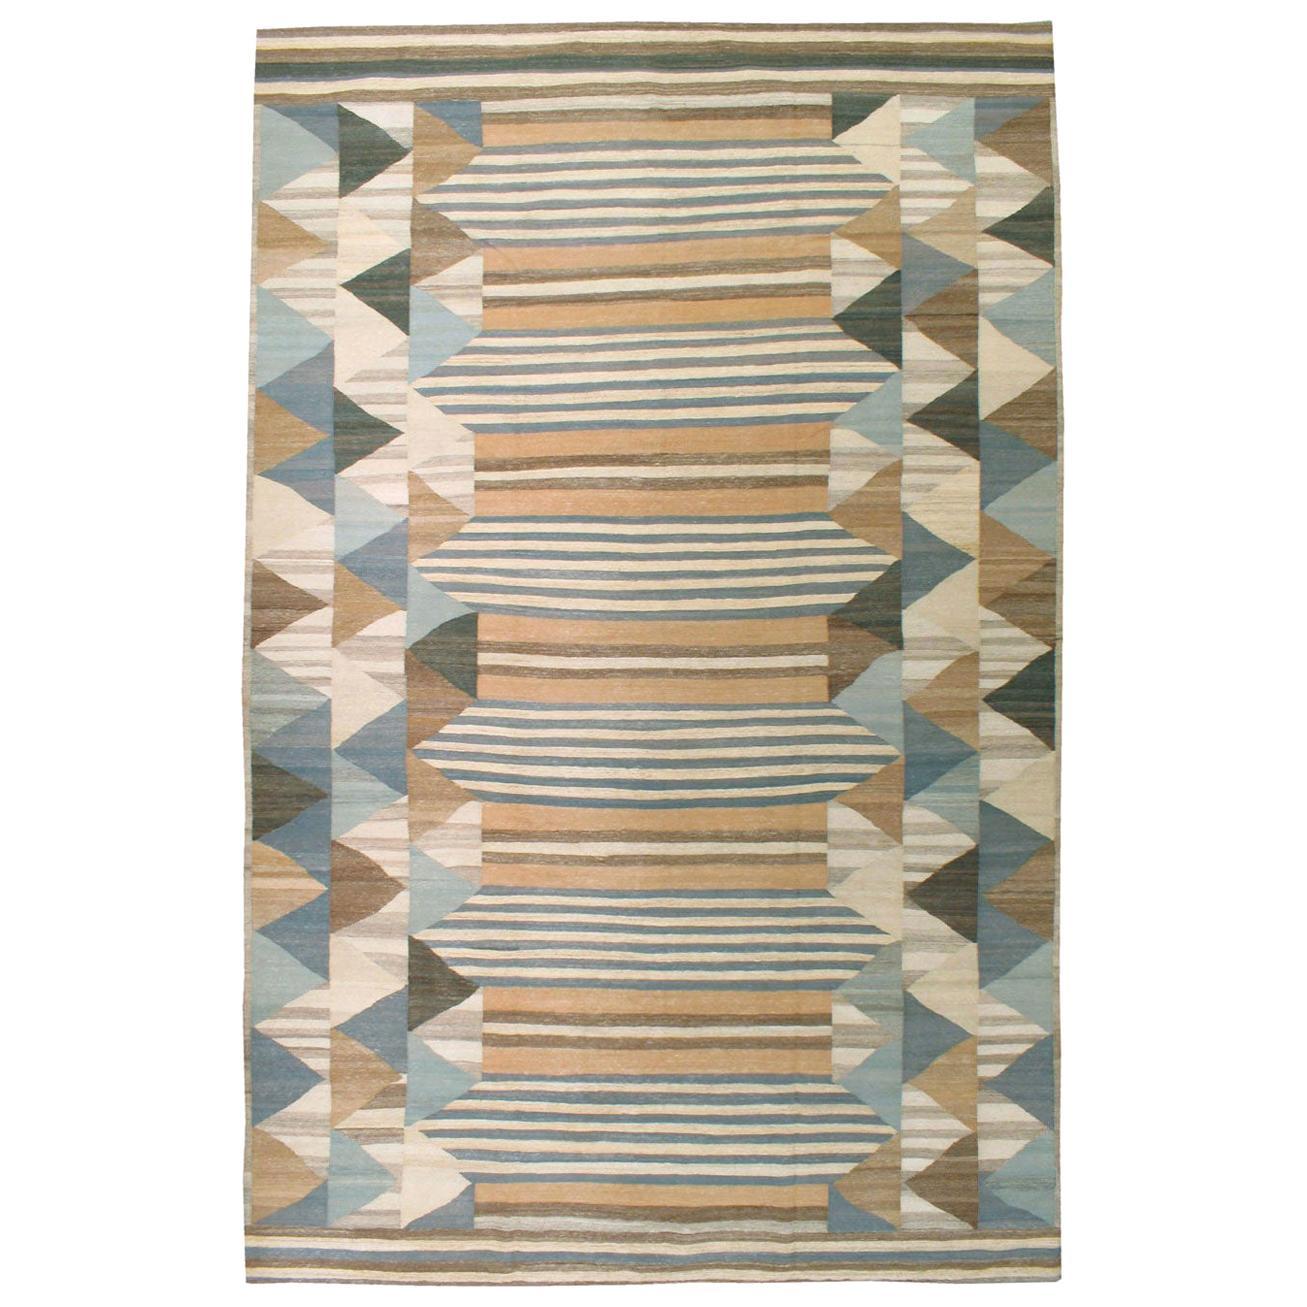 Contemporary Handmade Swedish Inspired Persian Large Flat-Weave Rug